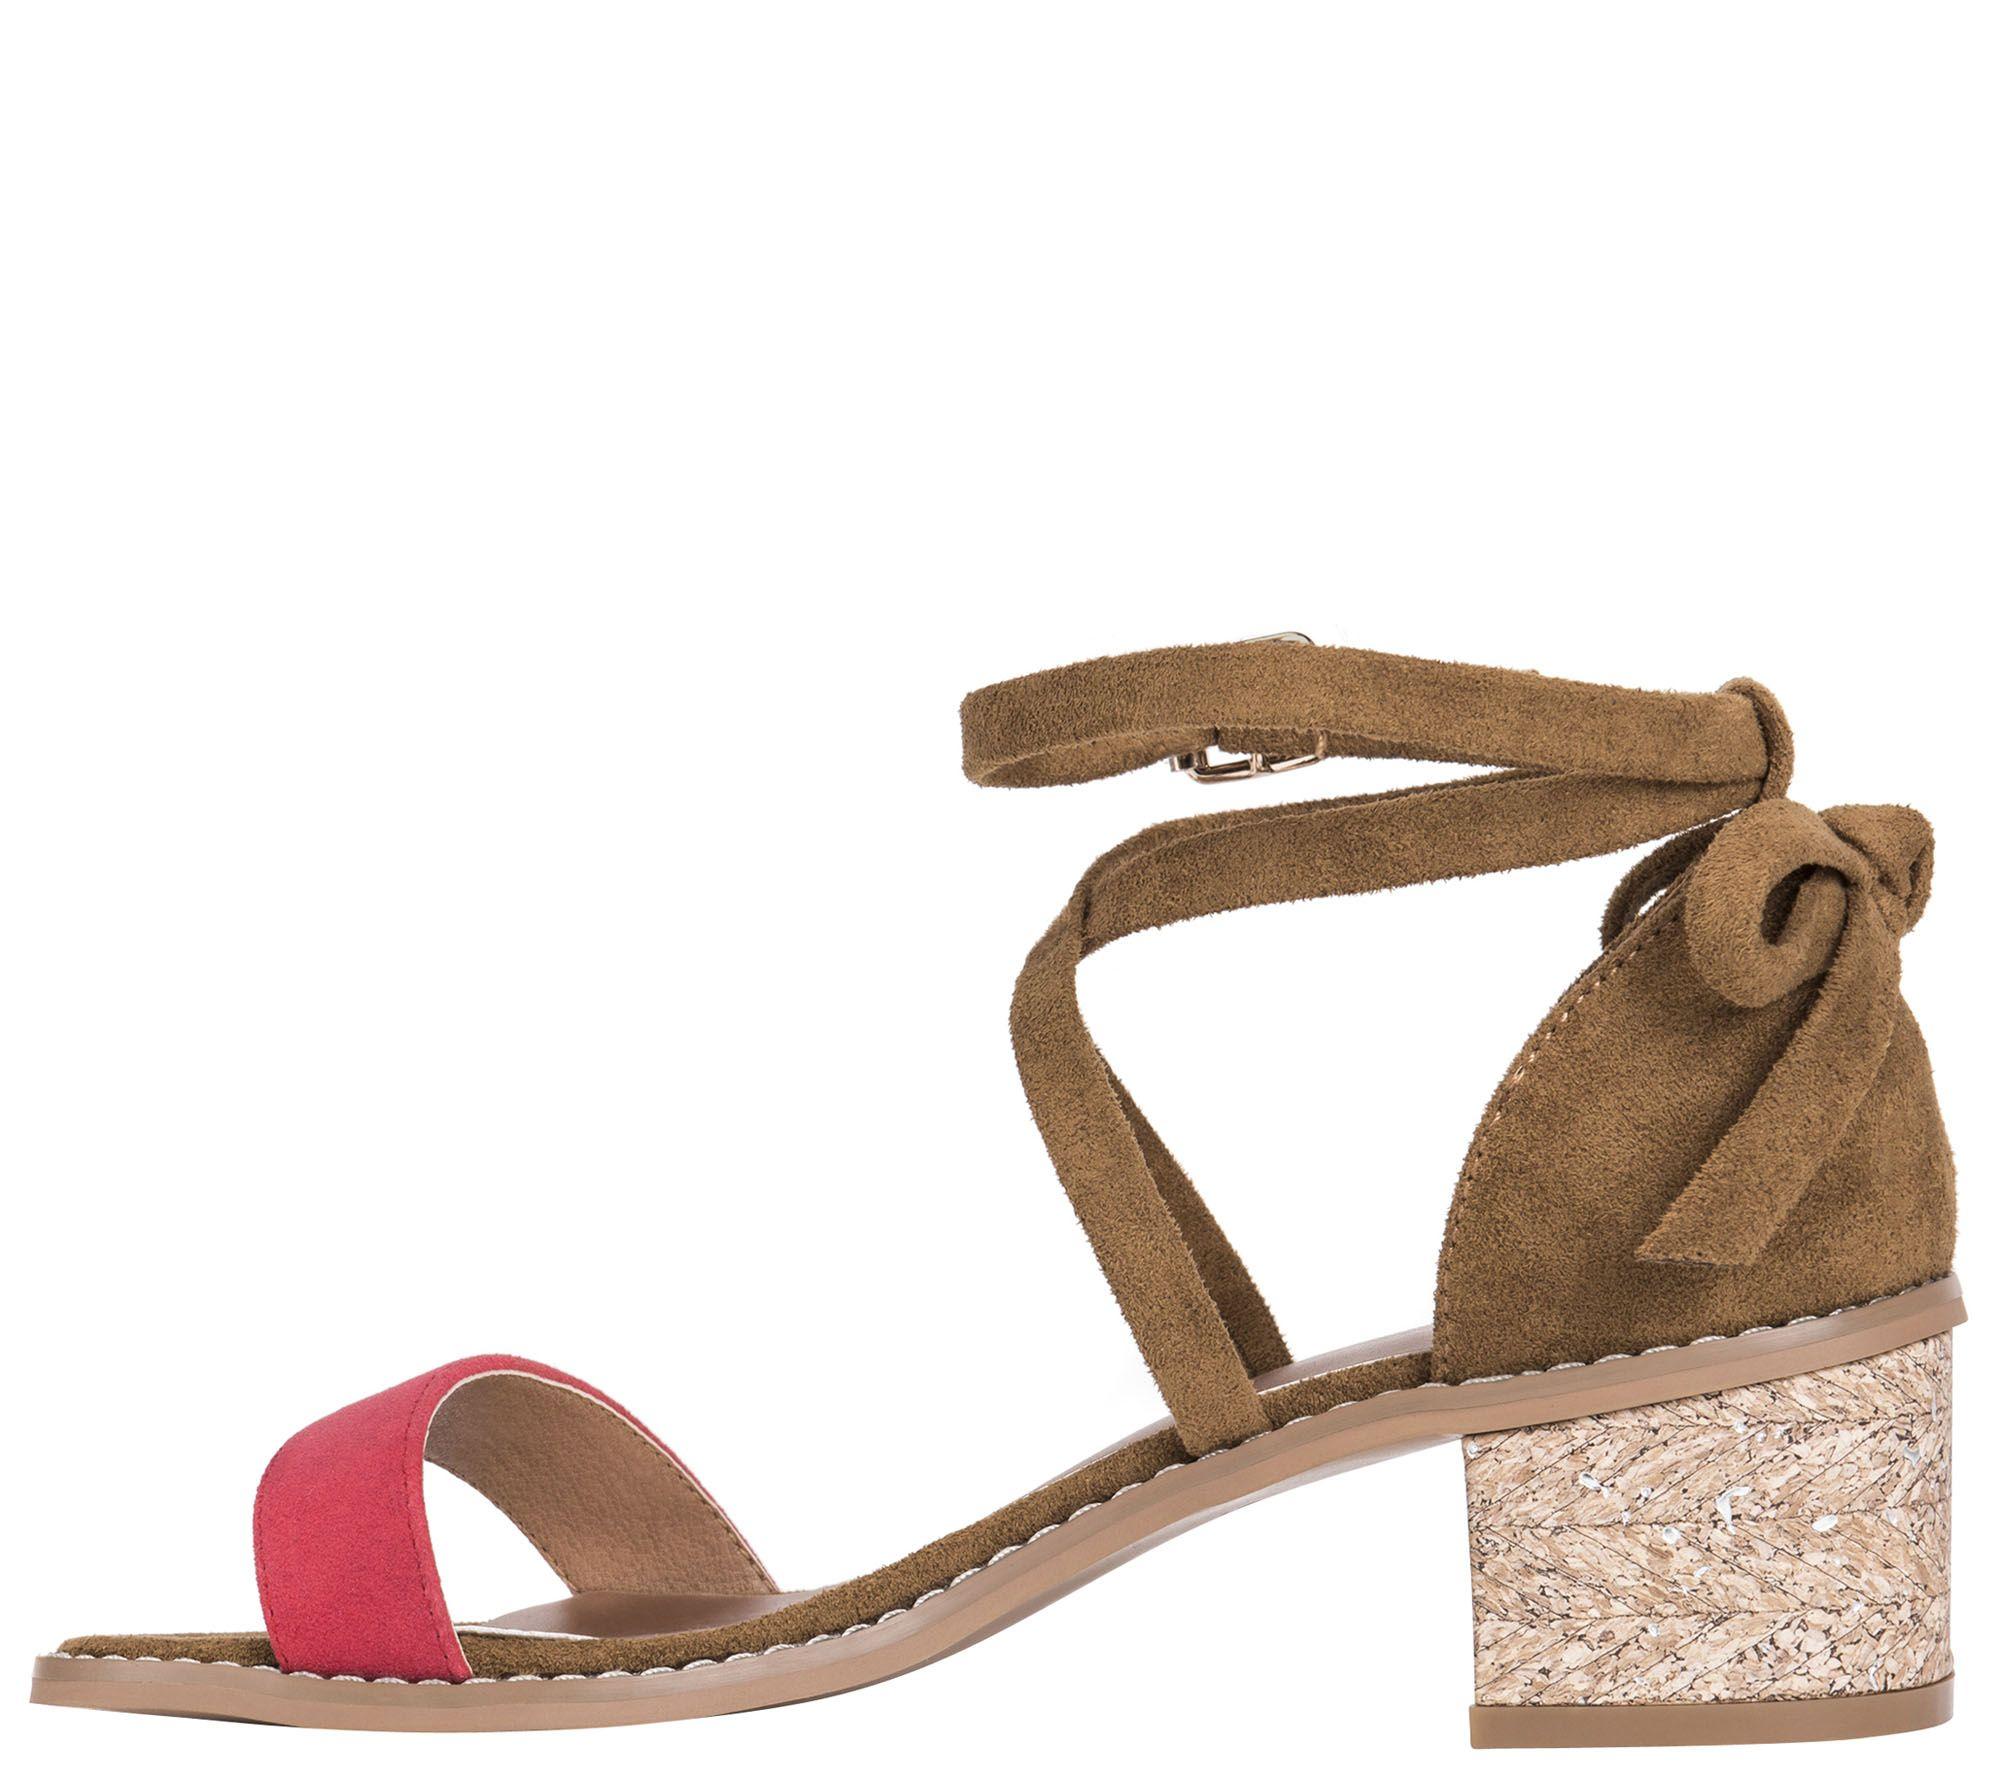 024f933c1a46 MUK LUKS Sandals - Sasha — QVC.com